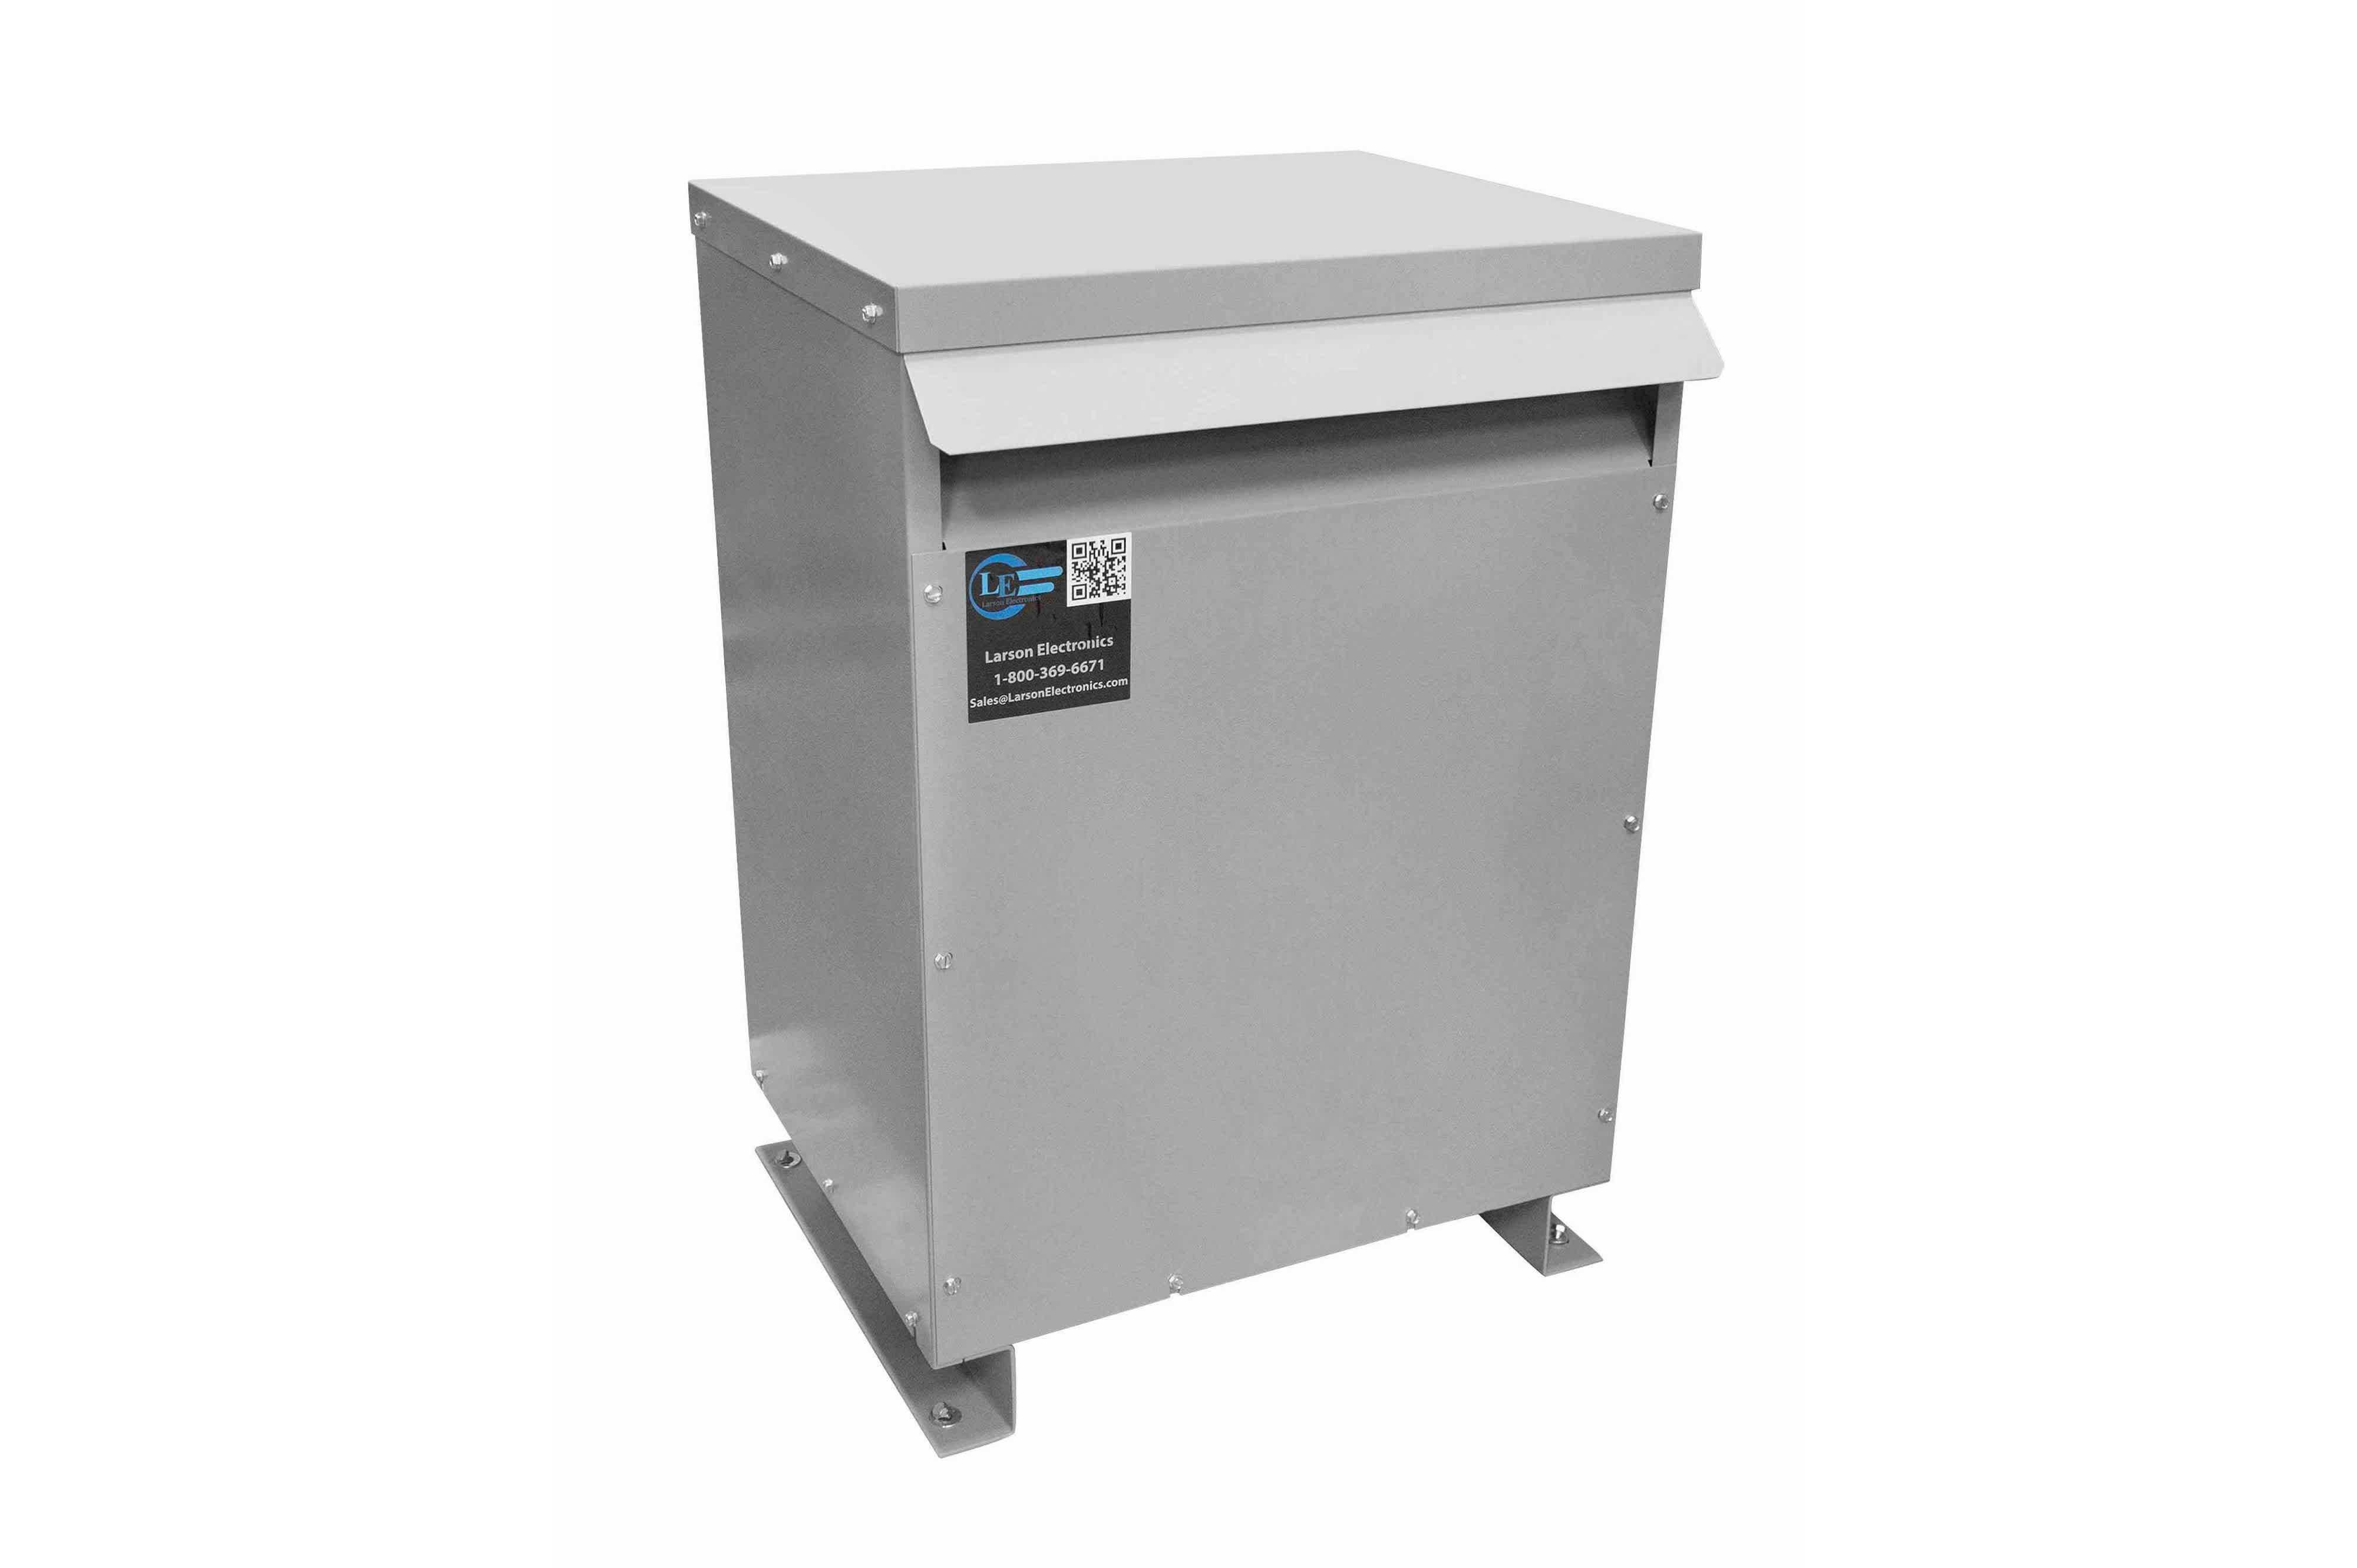 700 kVA 3PH Isolation Transformer, 480V Wye Primary, 240V/120 Delta Secondary, N3R, Ventilated, 60 Hz